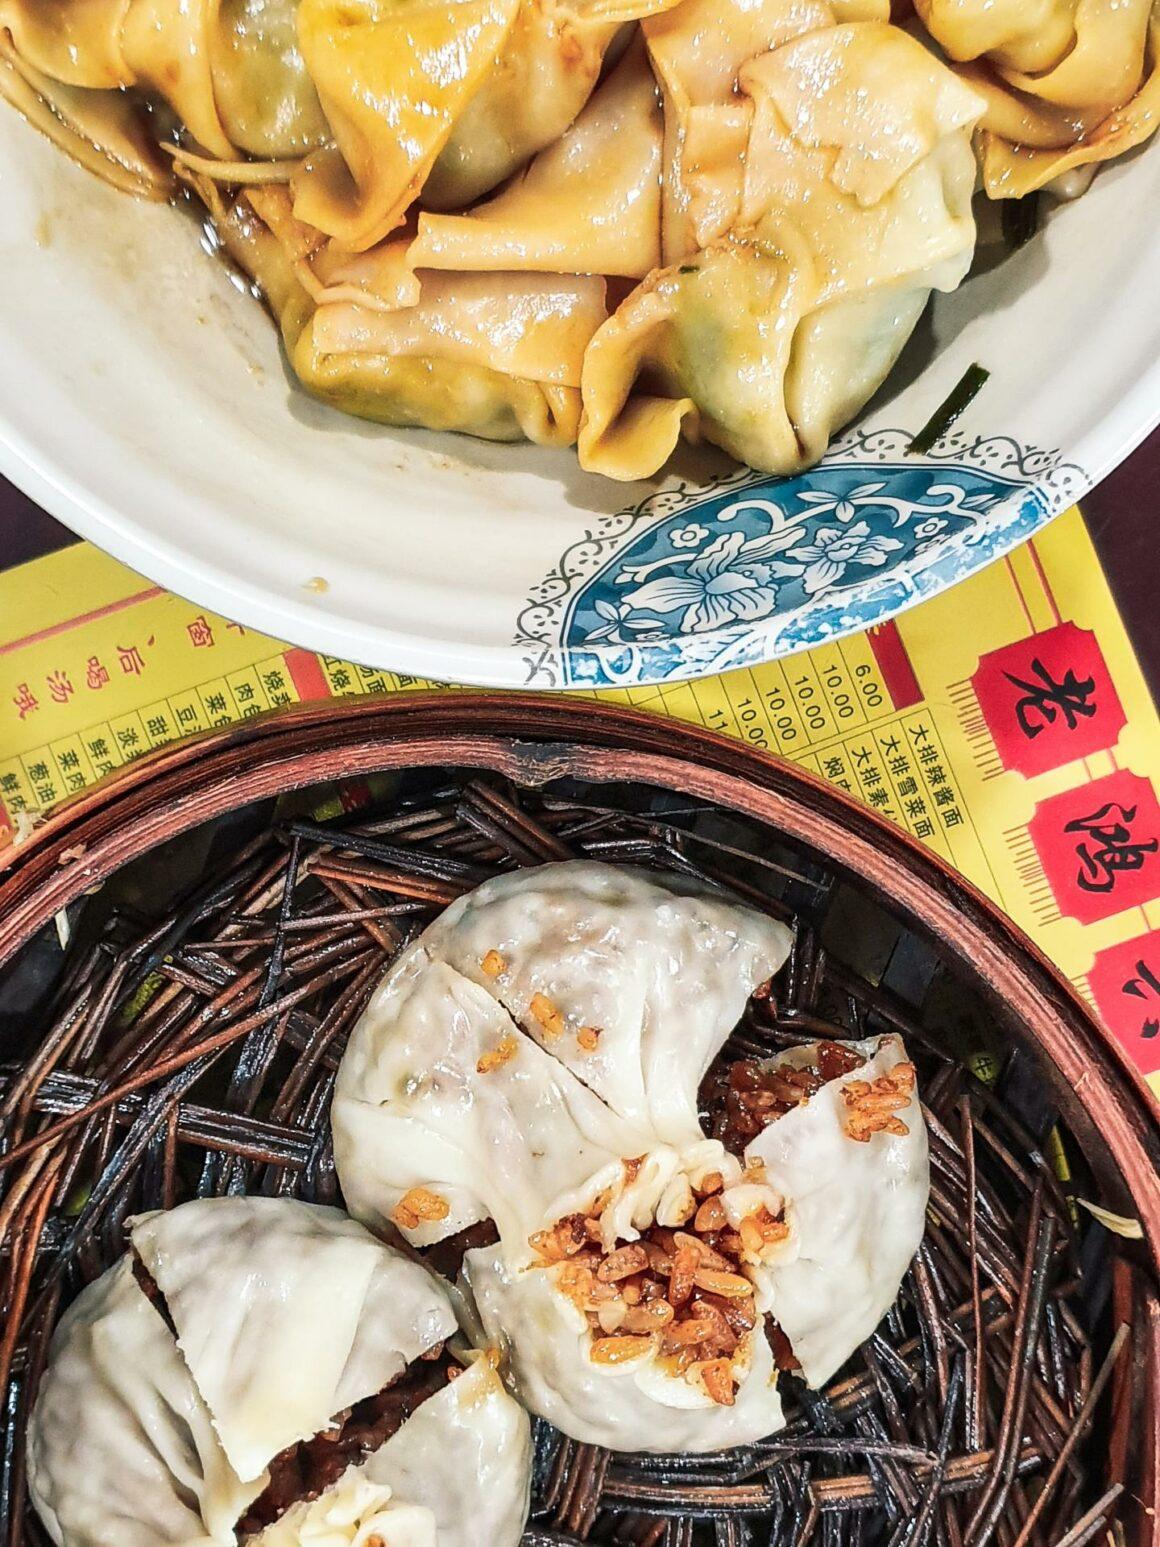 Shao Mai open-faced rice dumpling